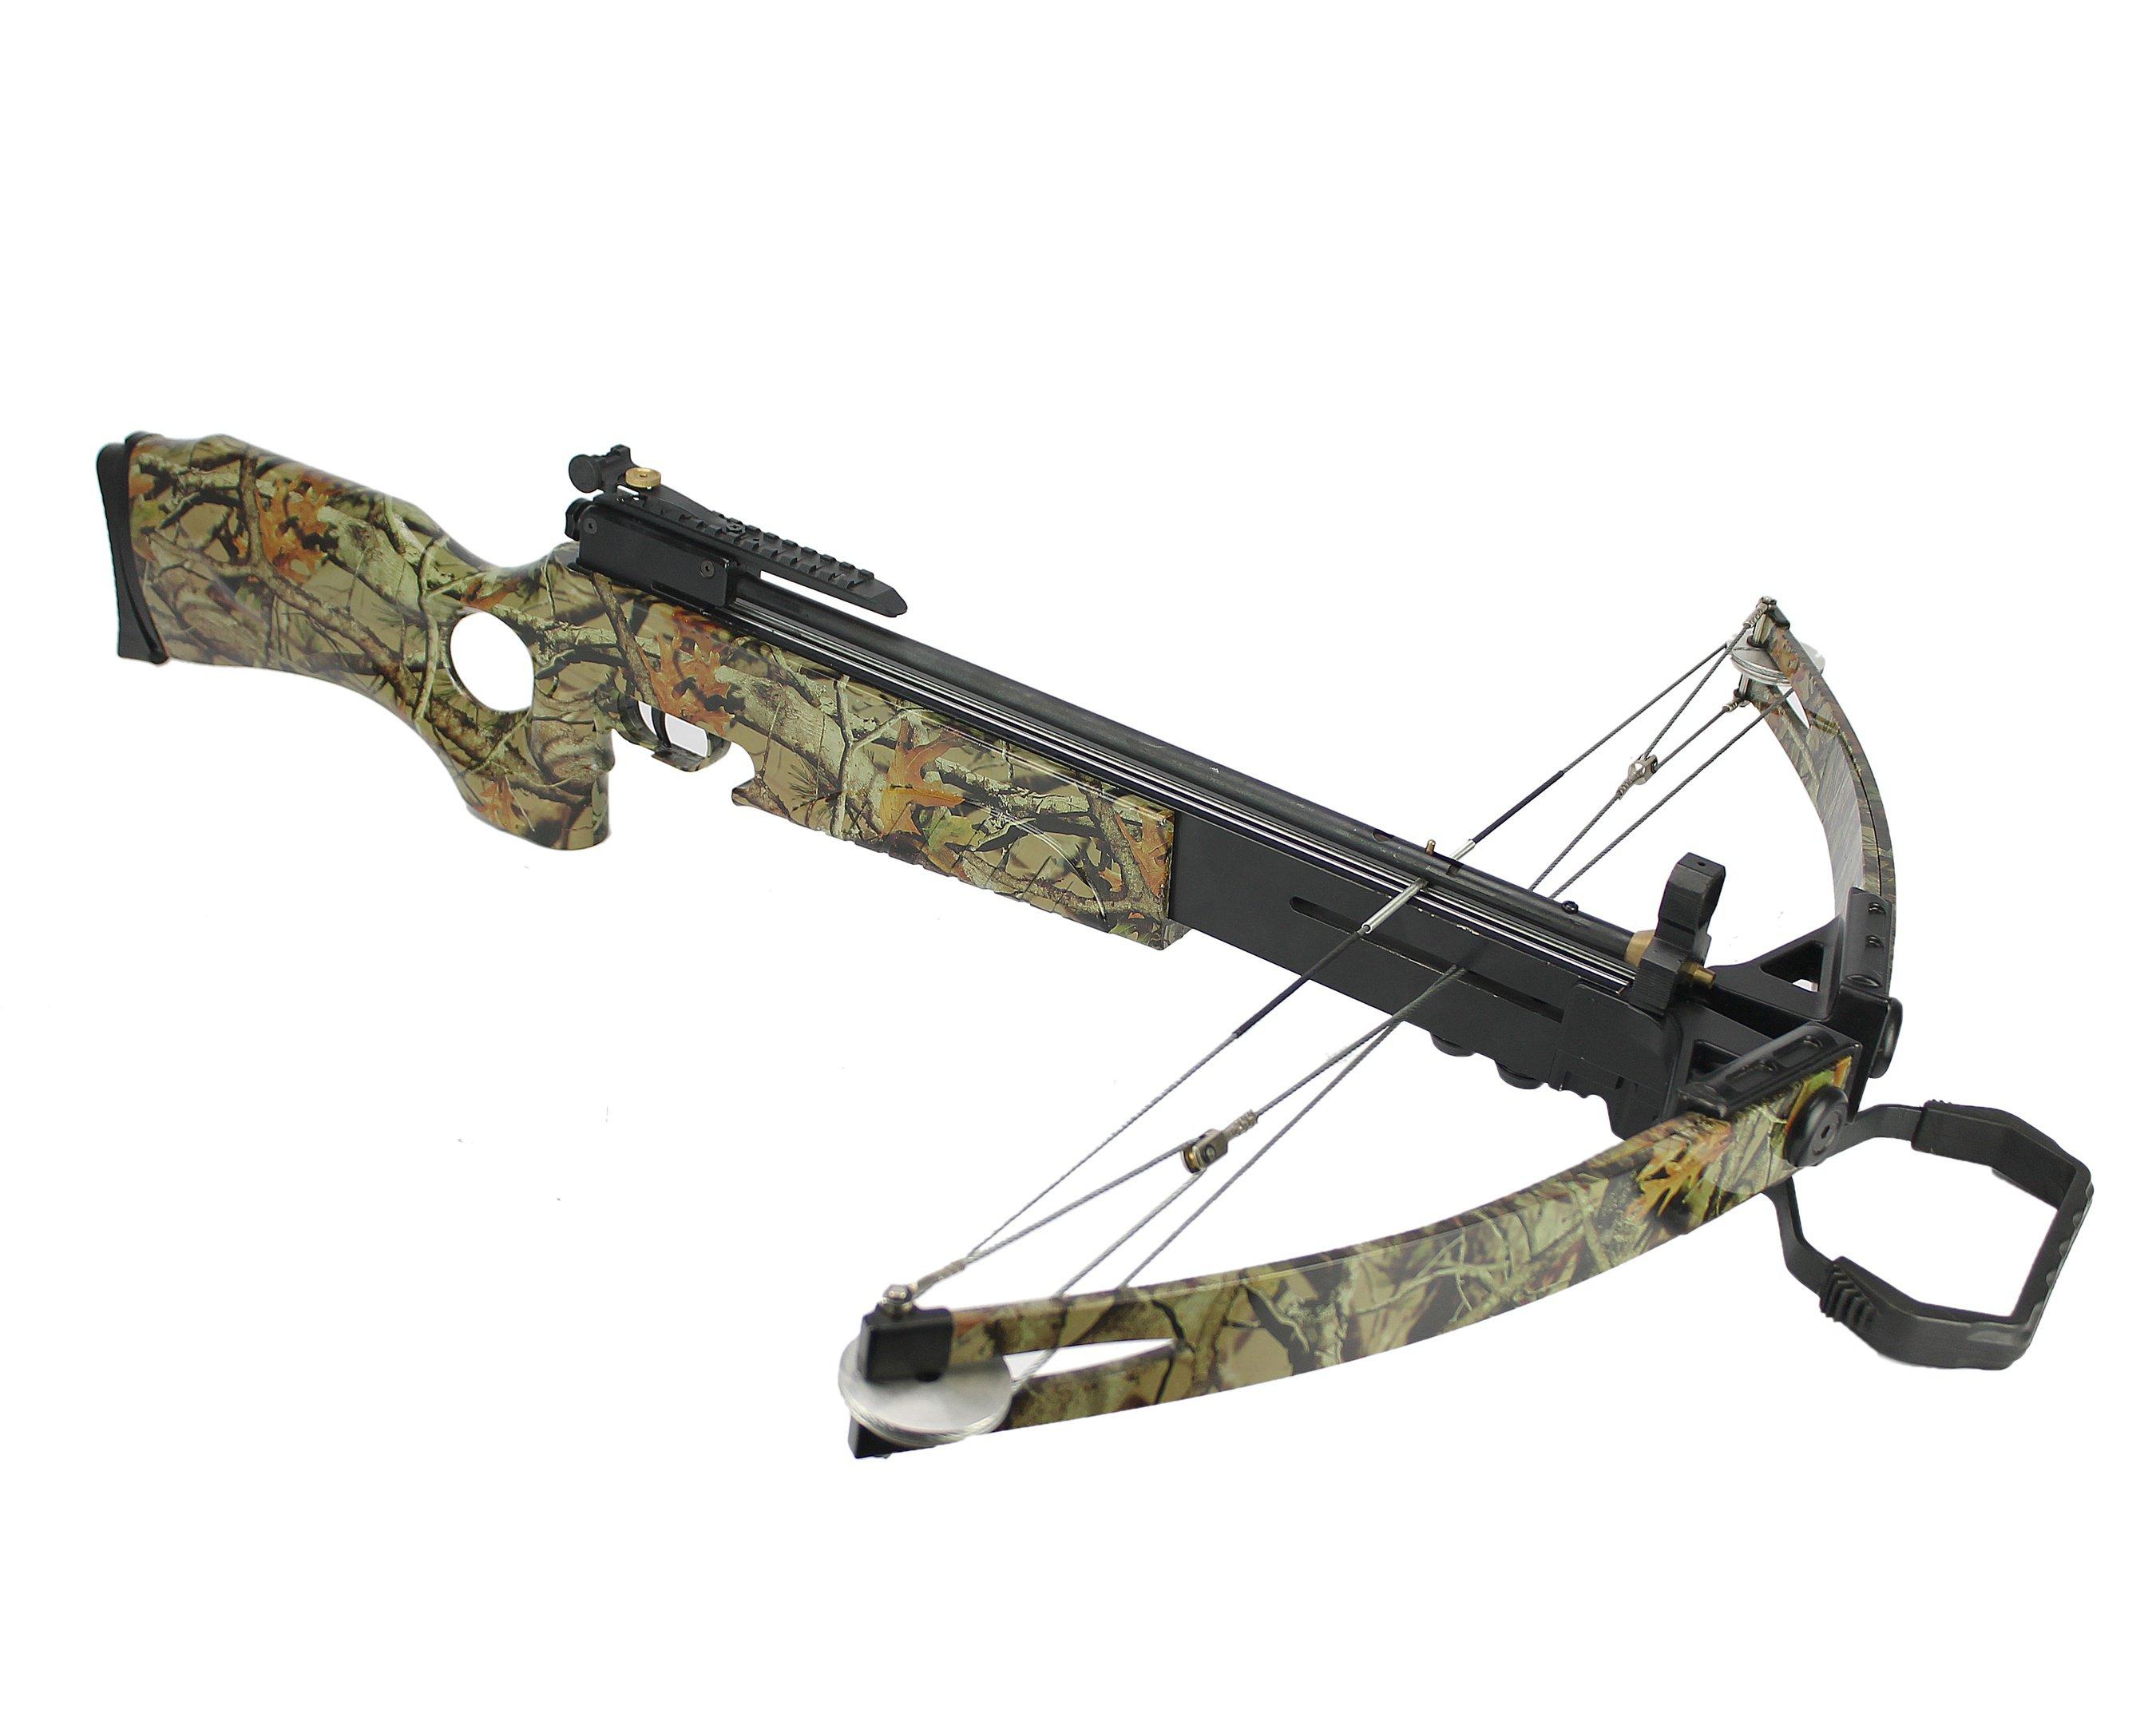 Balestra Modelo M58a 180 lbs- Junxing Archery